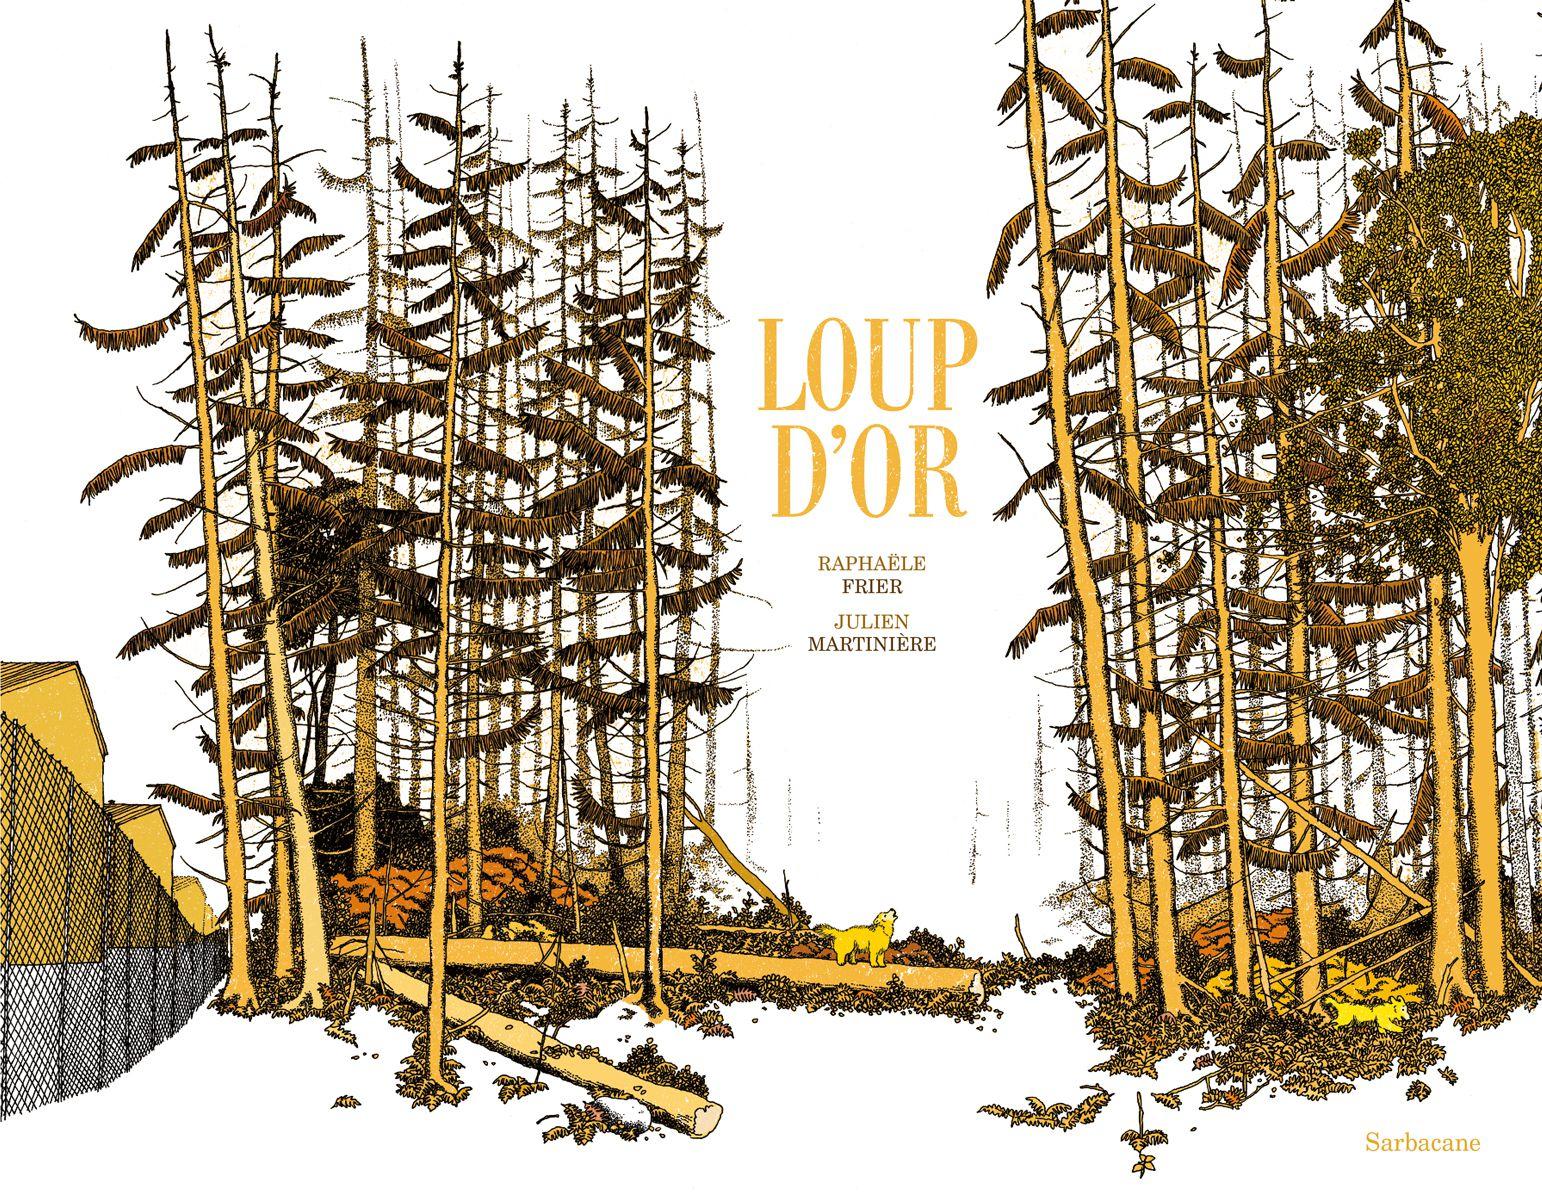 Loup d'Or / Raphaèle Fraer, Julien Martiniere - Sarbacane